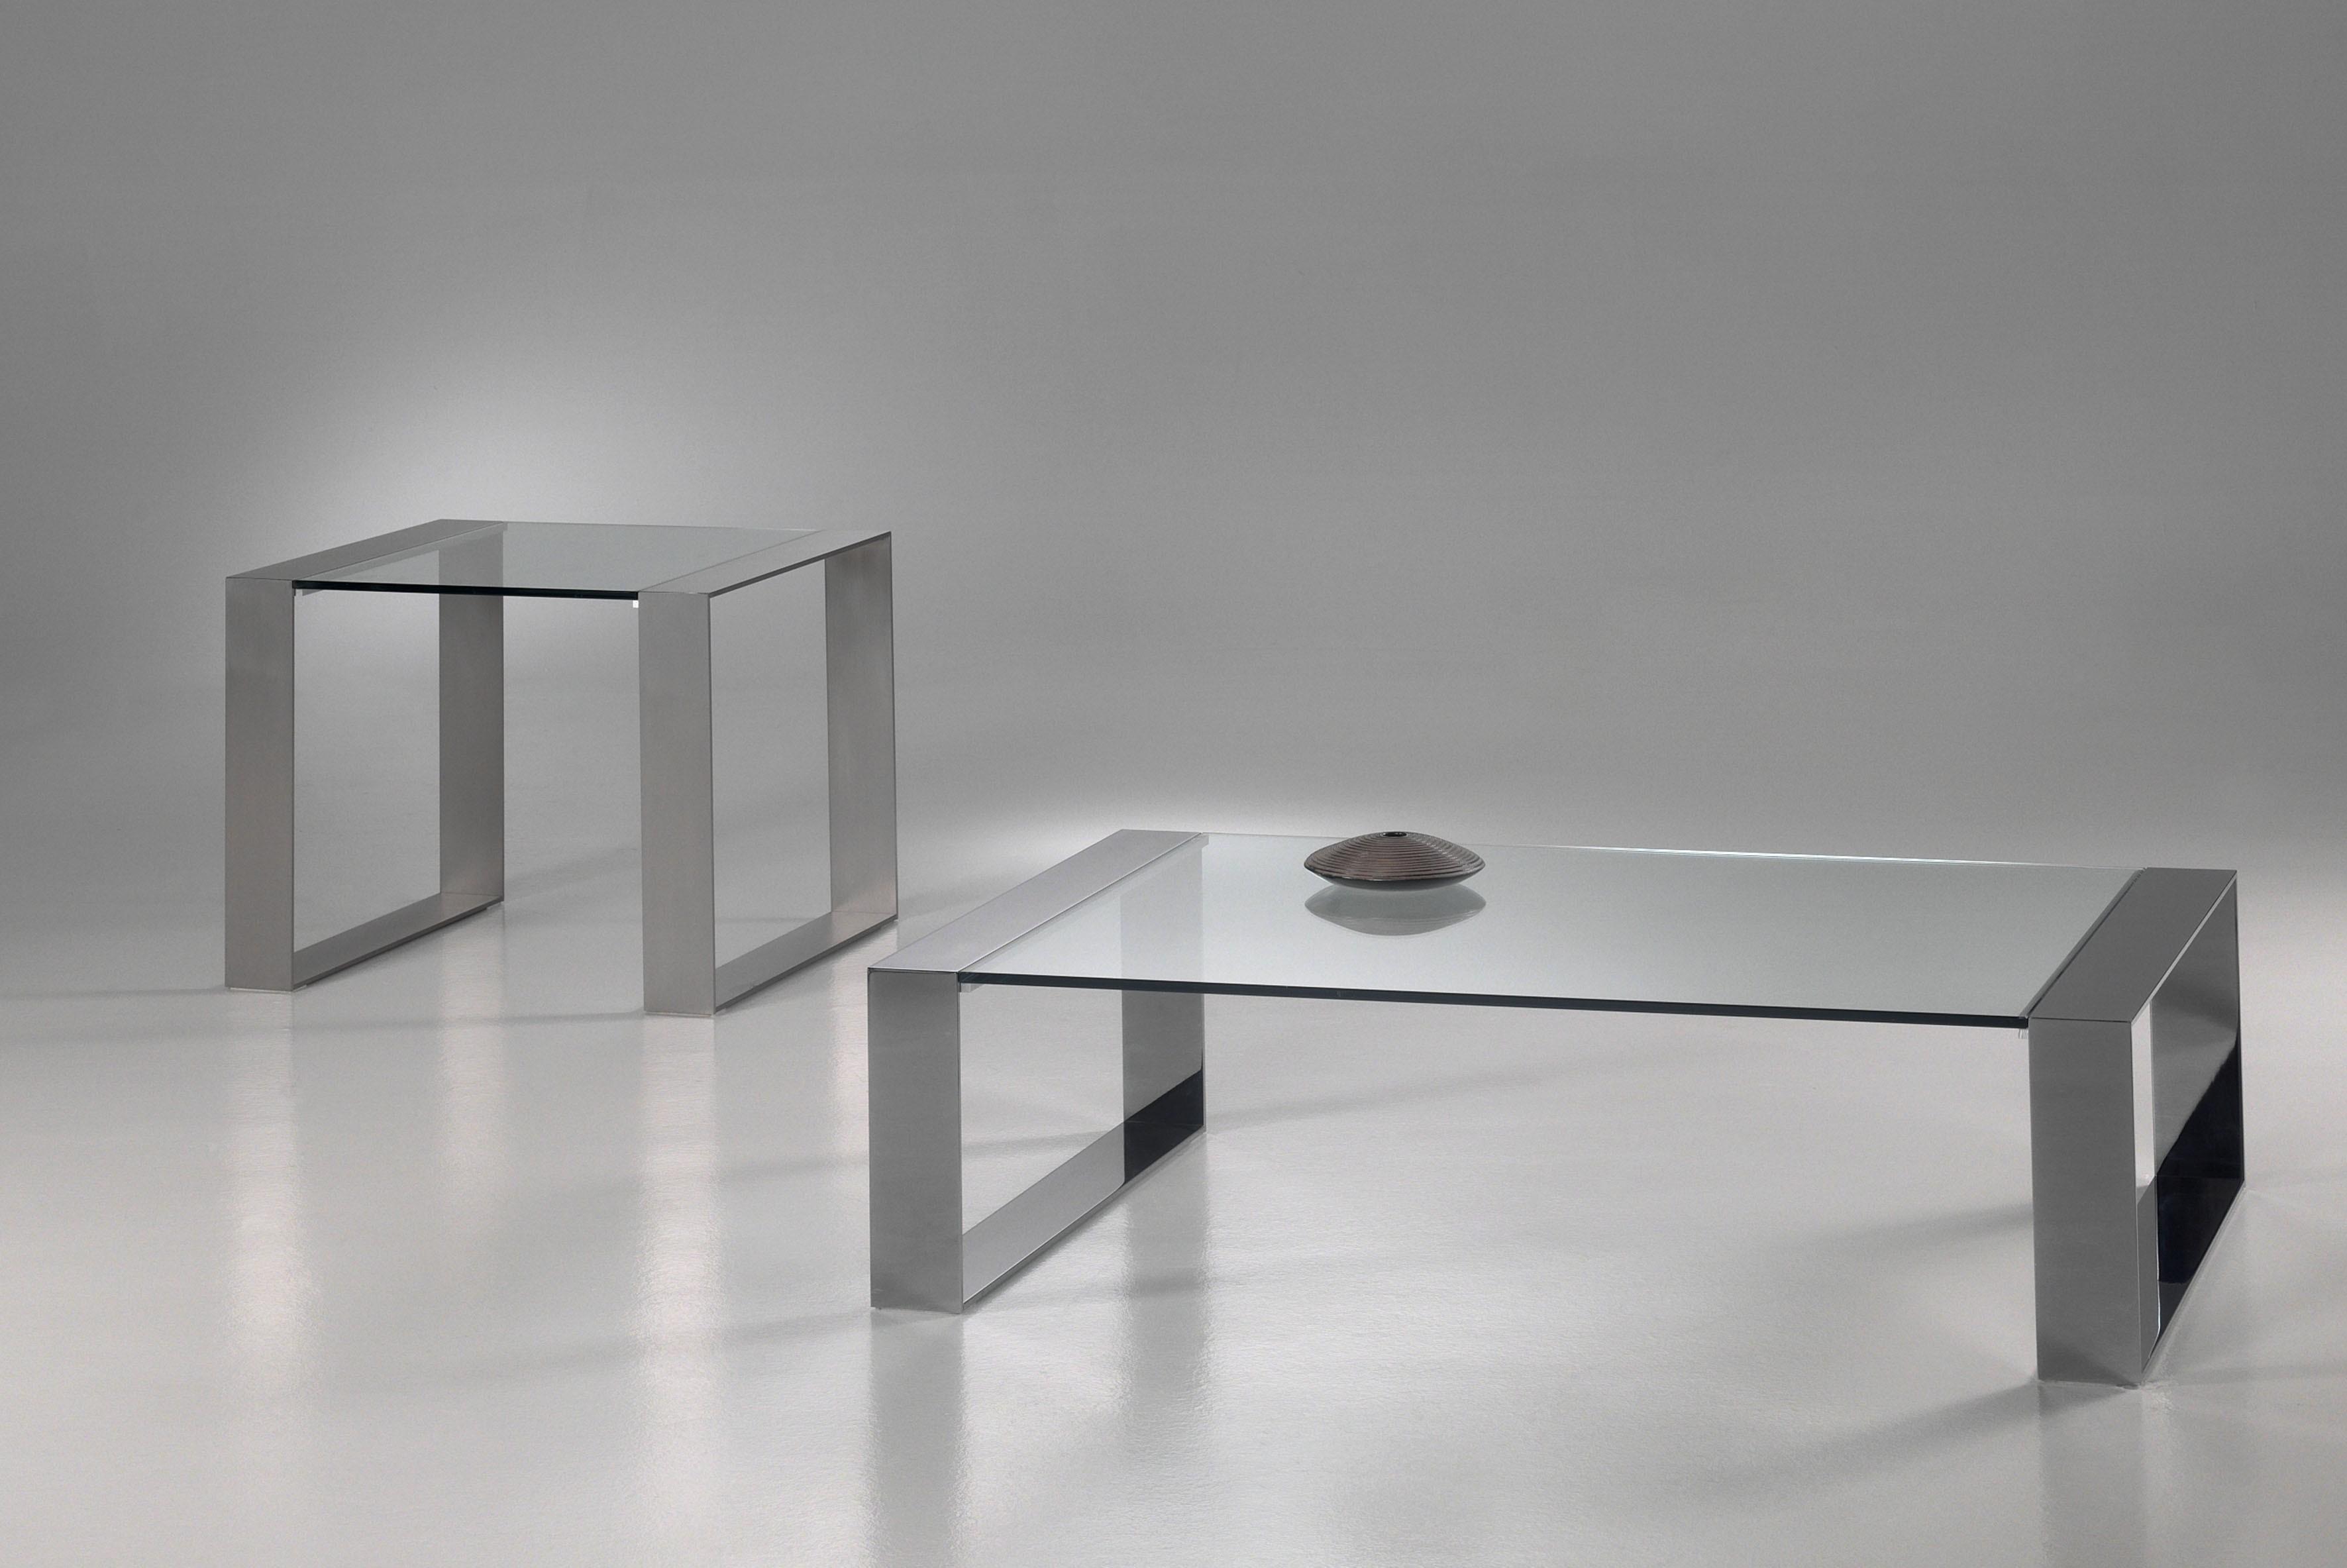 Bijzettafel Glas Chroom Vierkant.Glazen Salontafel Modena